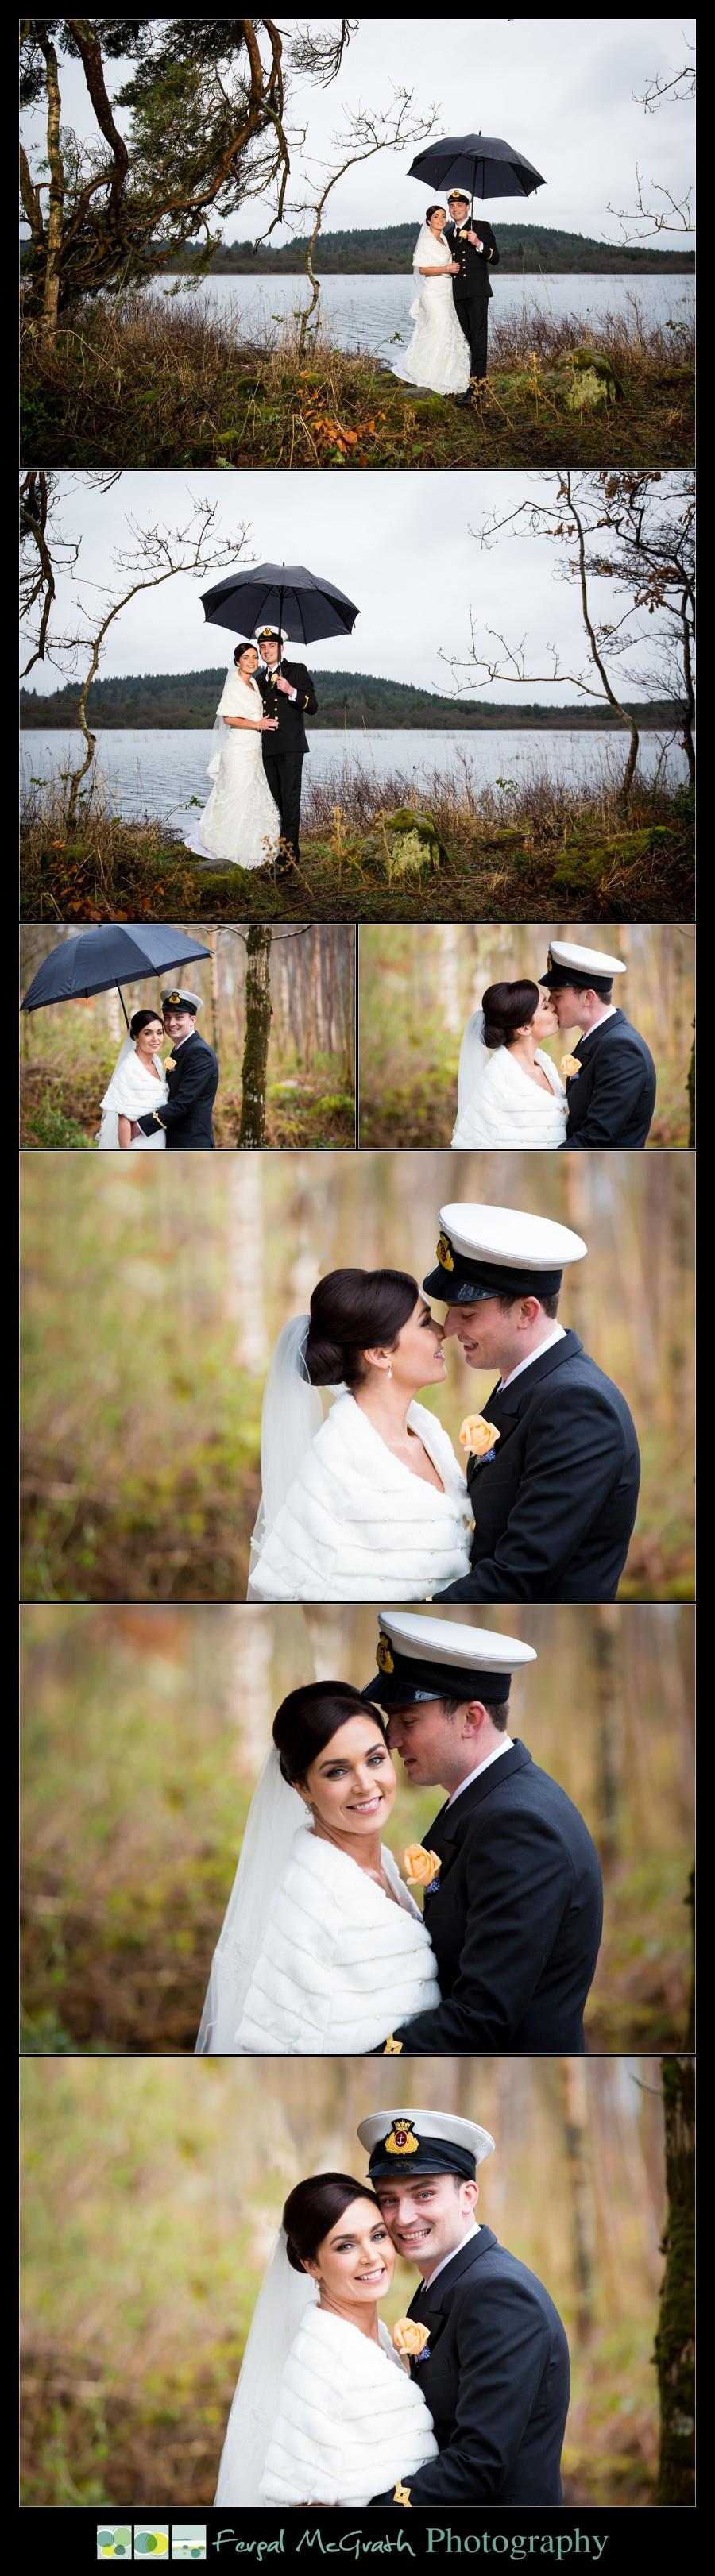 Castle Dargan Hotel Wedding Jamie and Andrew stunning couples photos